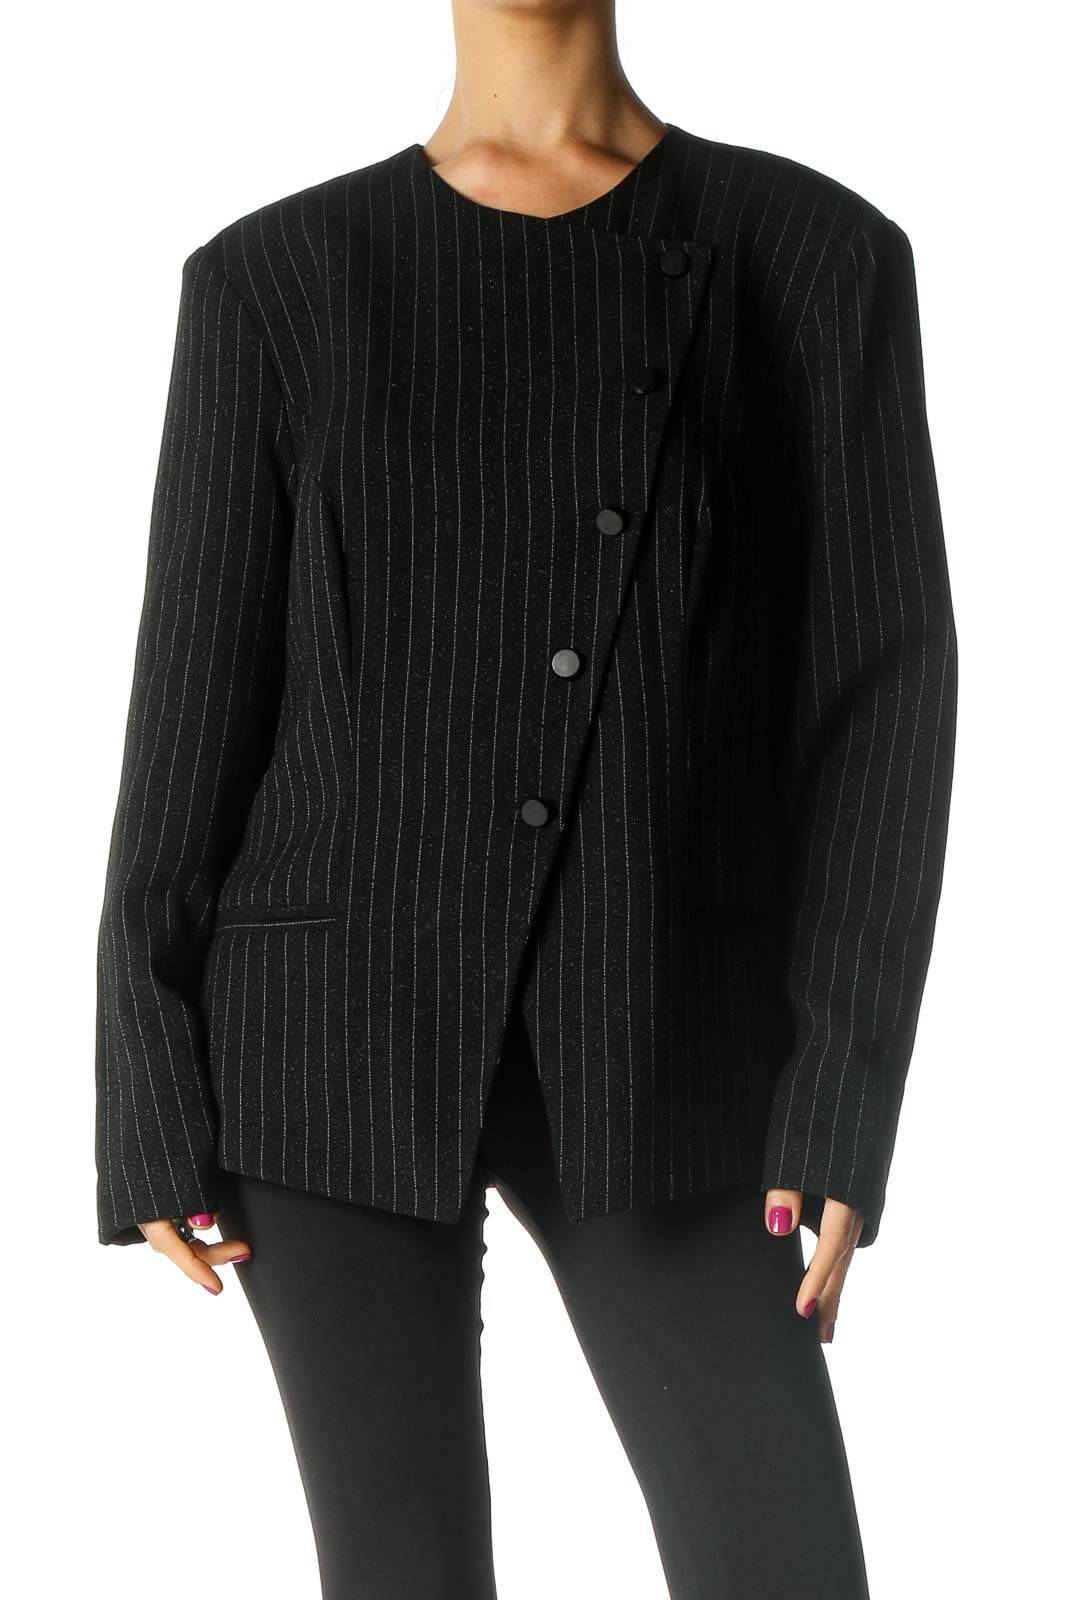 Black Striped Retro Jacket Front